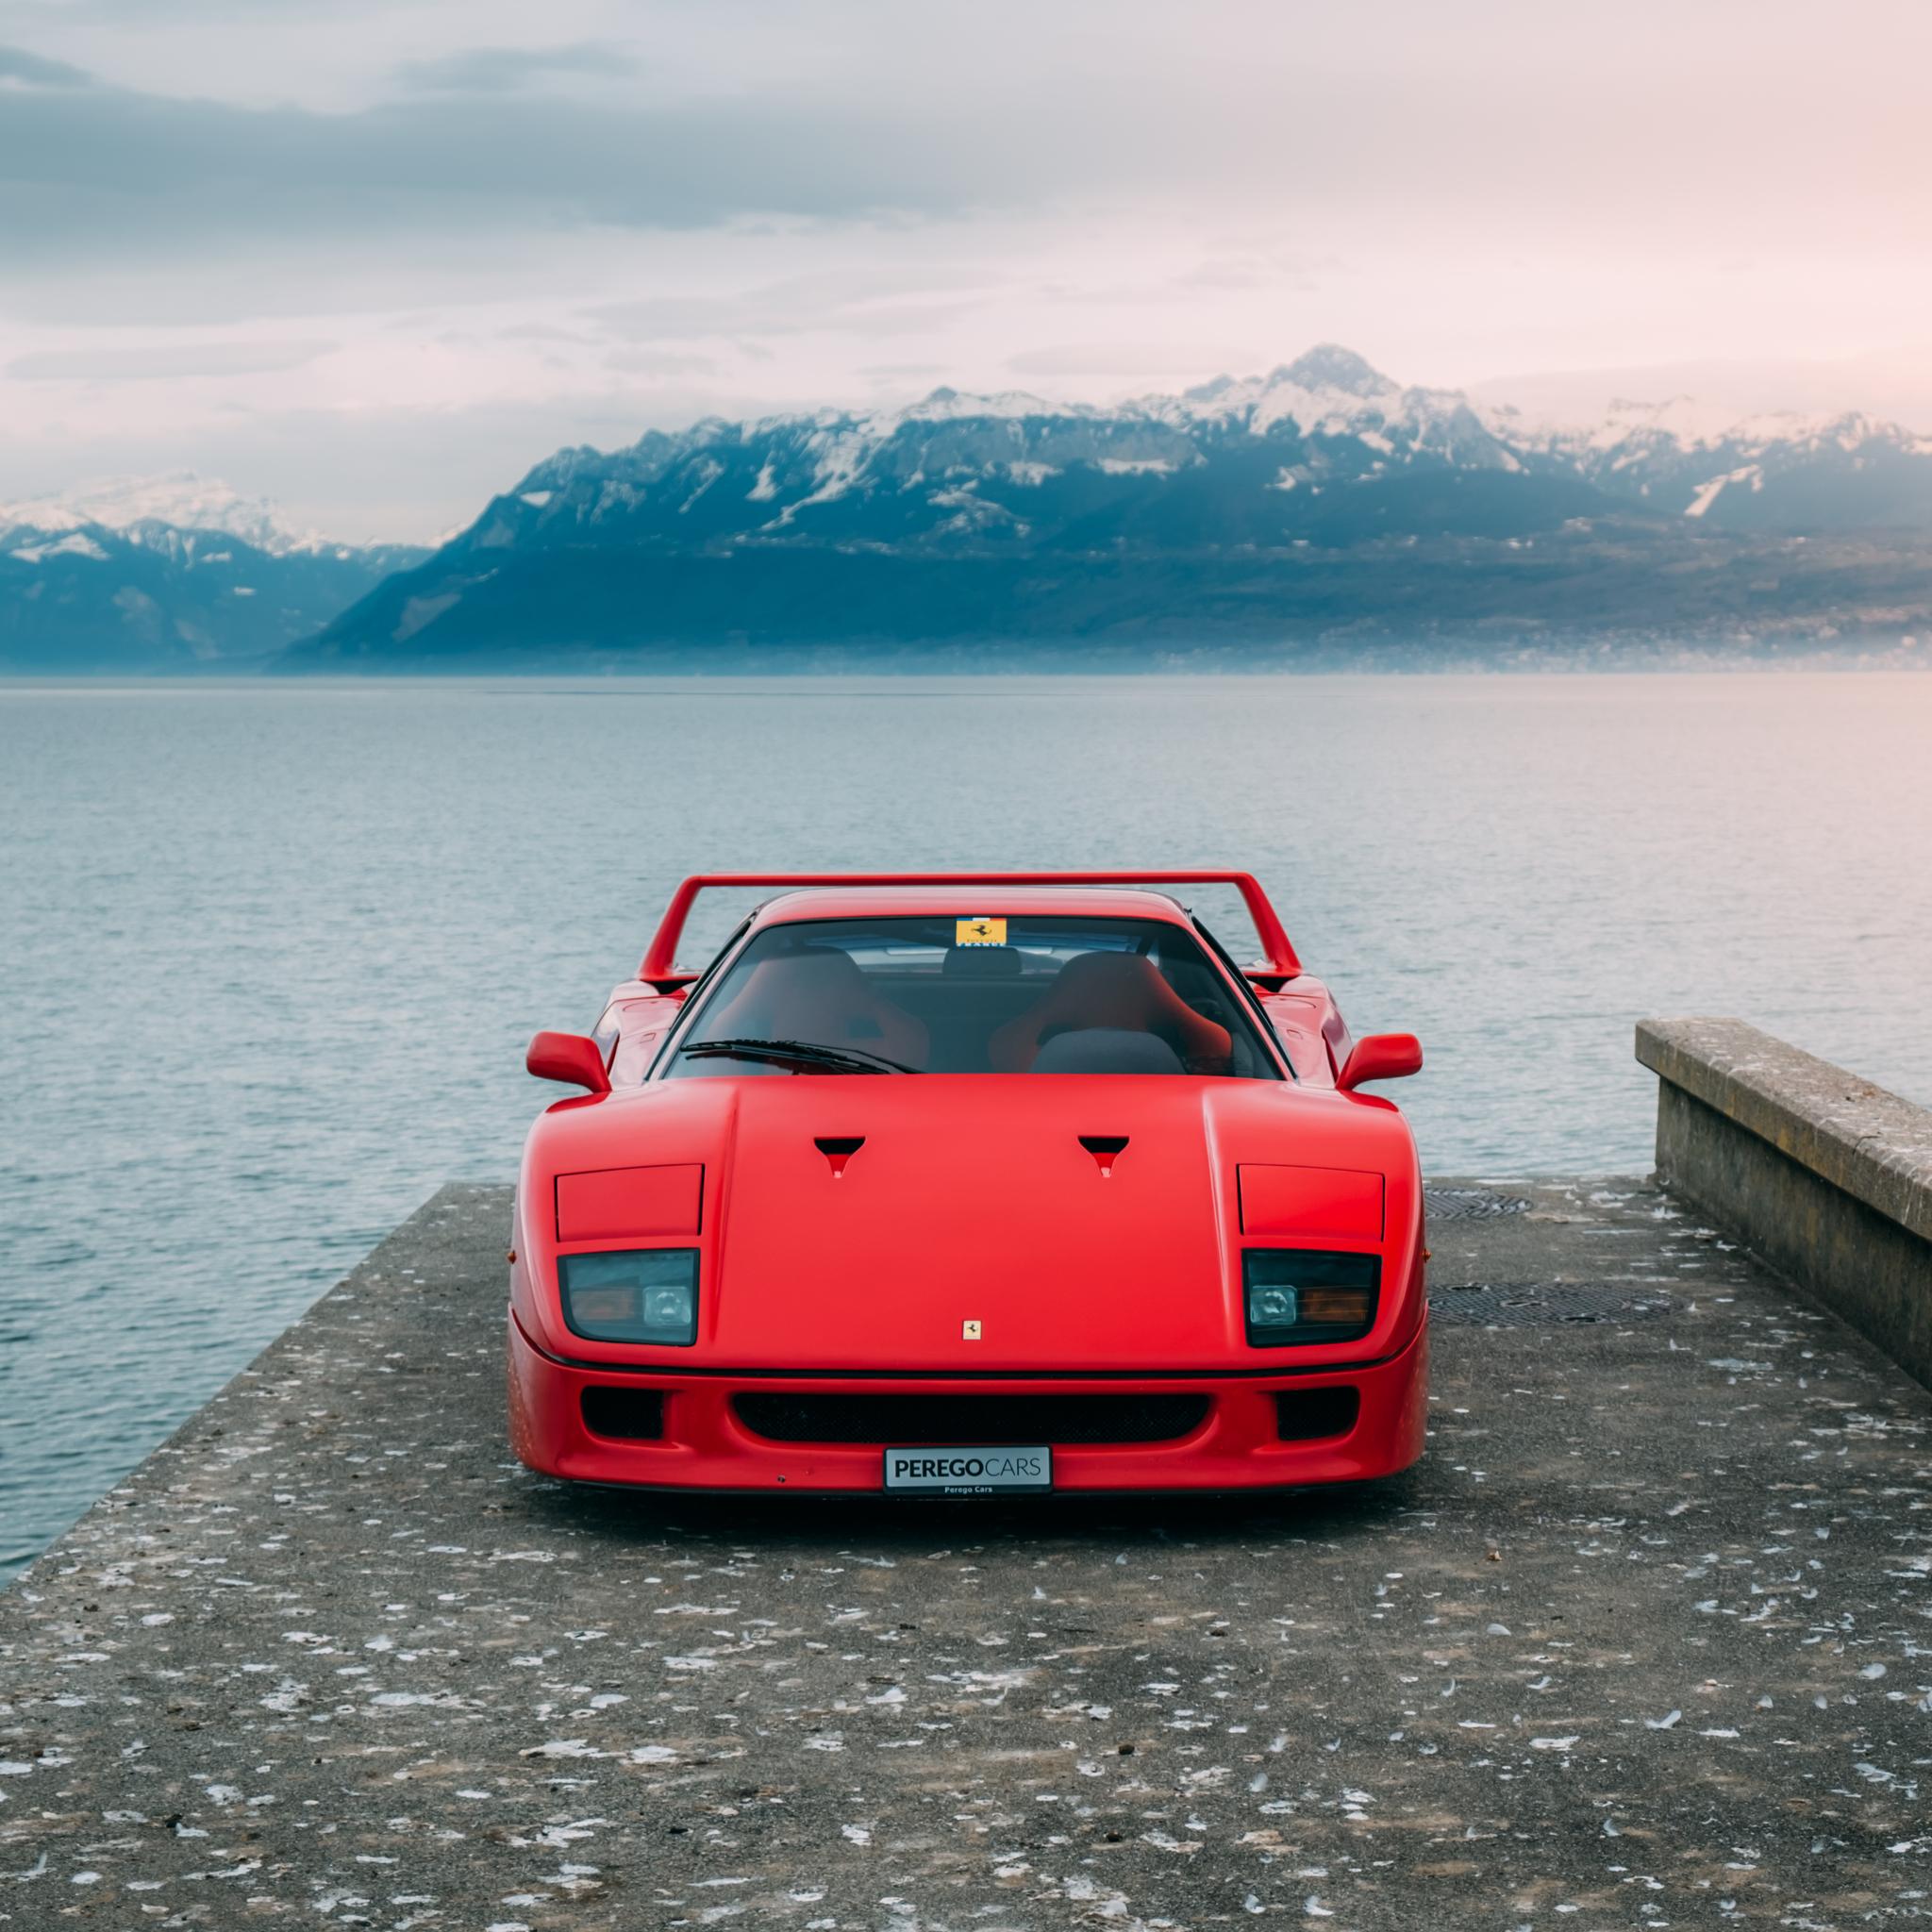 2048x2048 Ferrari F40 5k Ipad Air HD 4k Wallpapers, Images